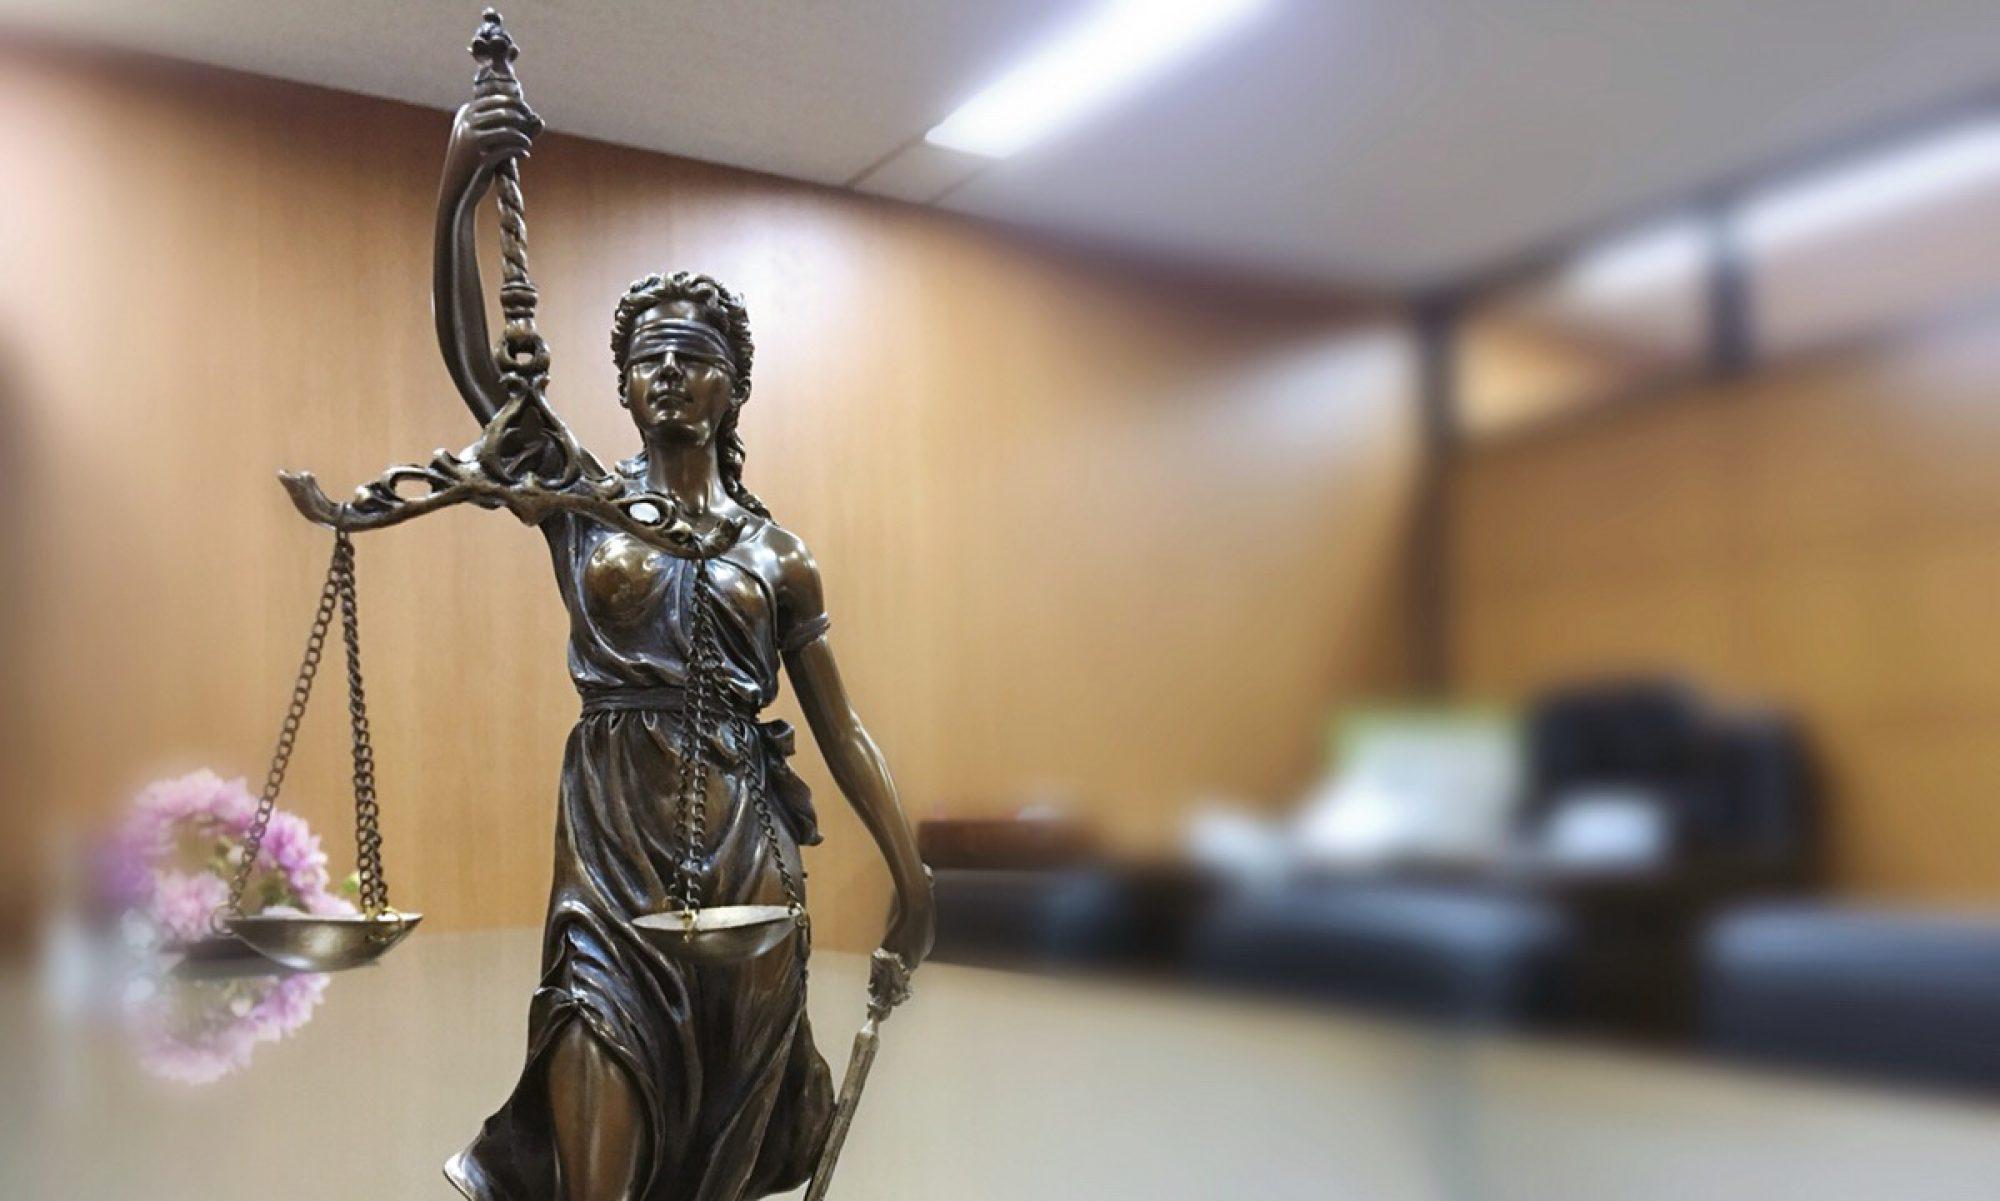 あおば弁護士法人大津総合法律事務所/滋賀・大津・弁護士